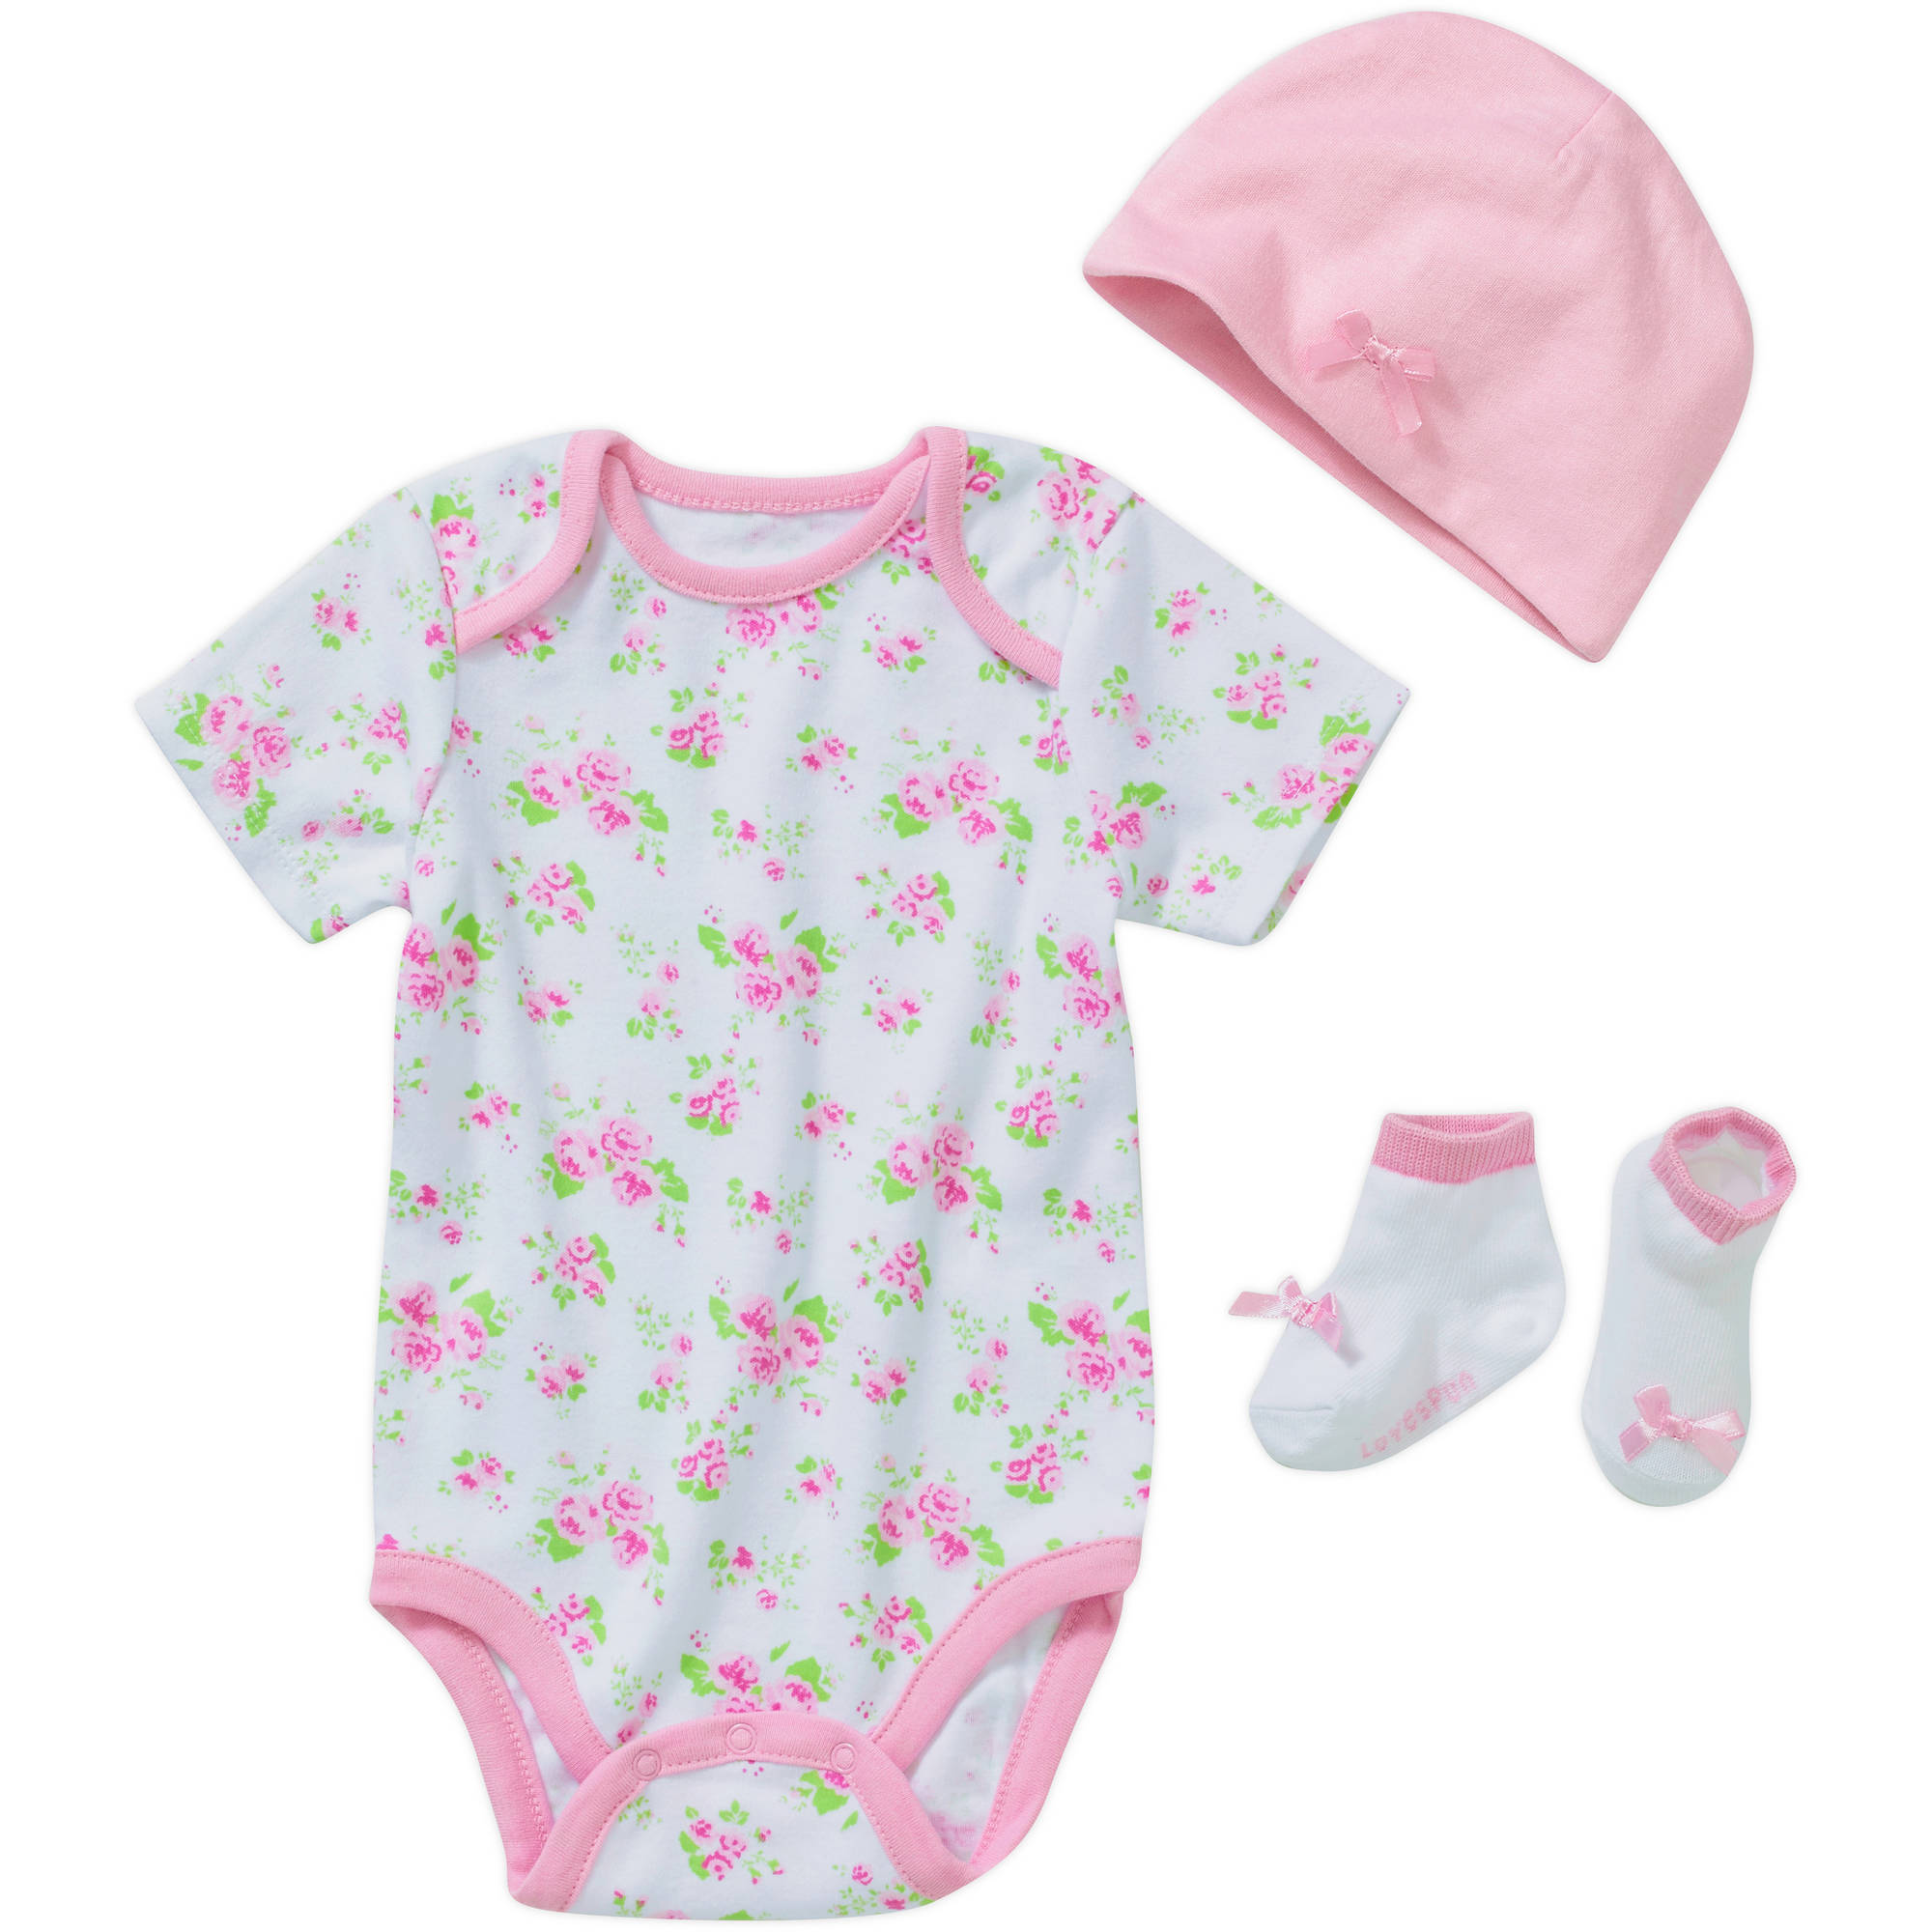 Lovespun - Lovespun Newborn Baby Girls  3 Piece Creeper 02c39231bbf